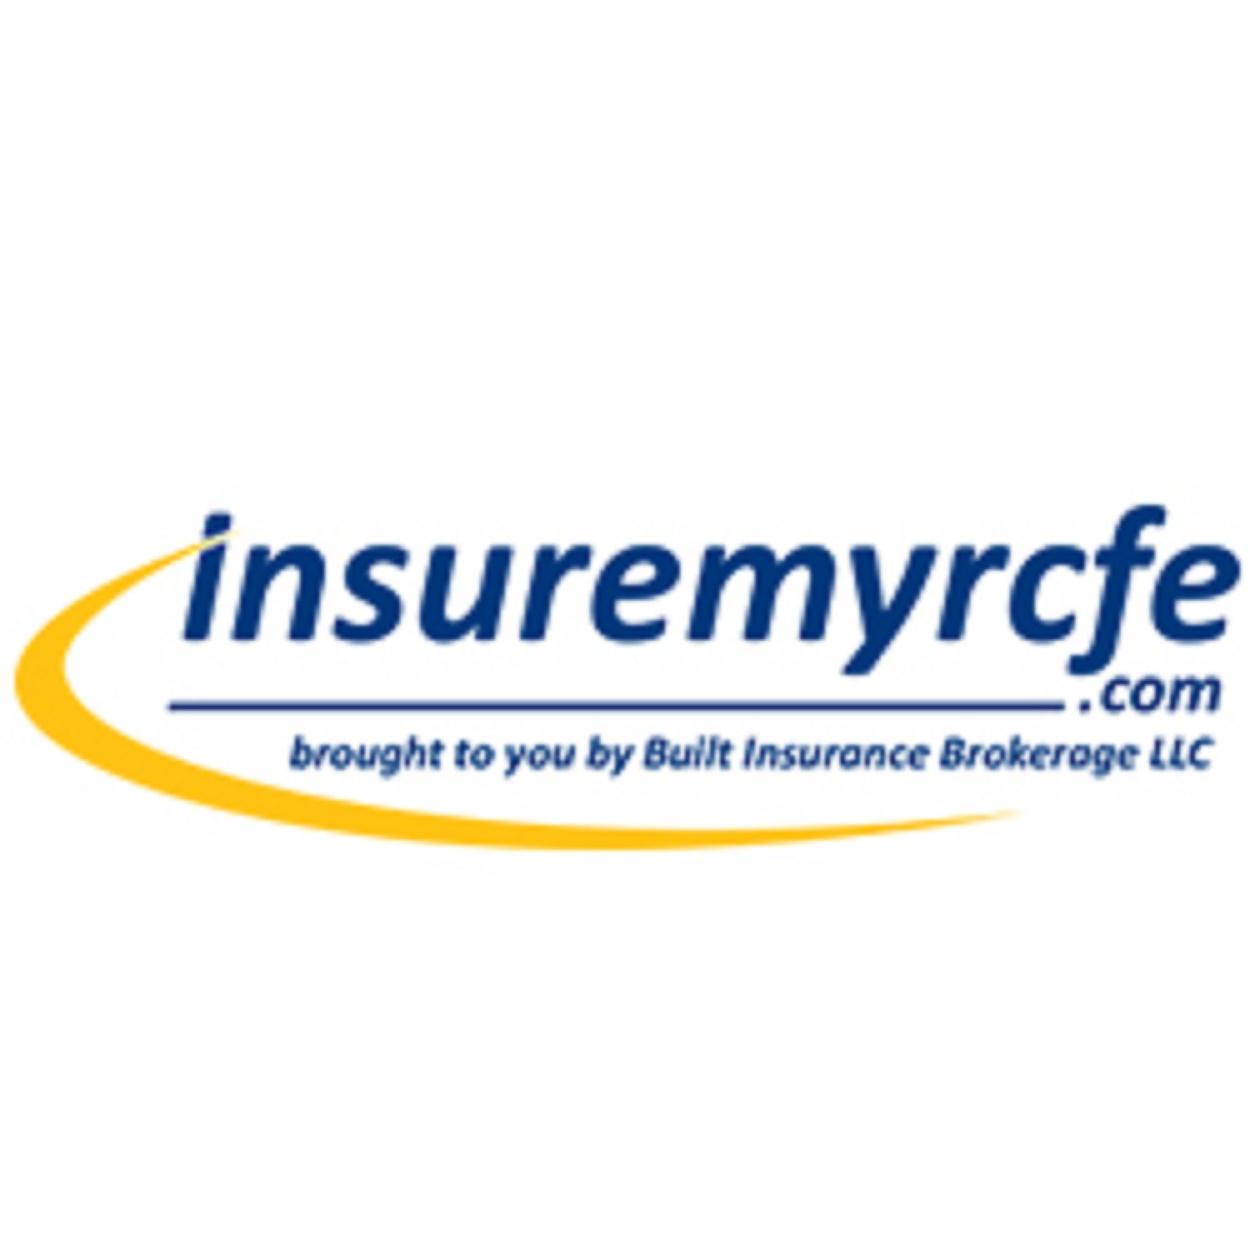 rcfeassisted_living_insurancebrokeragecalifornianursinghomeresidentialcarefacility_2.jpg